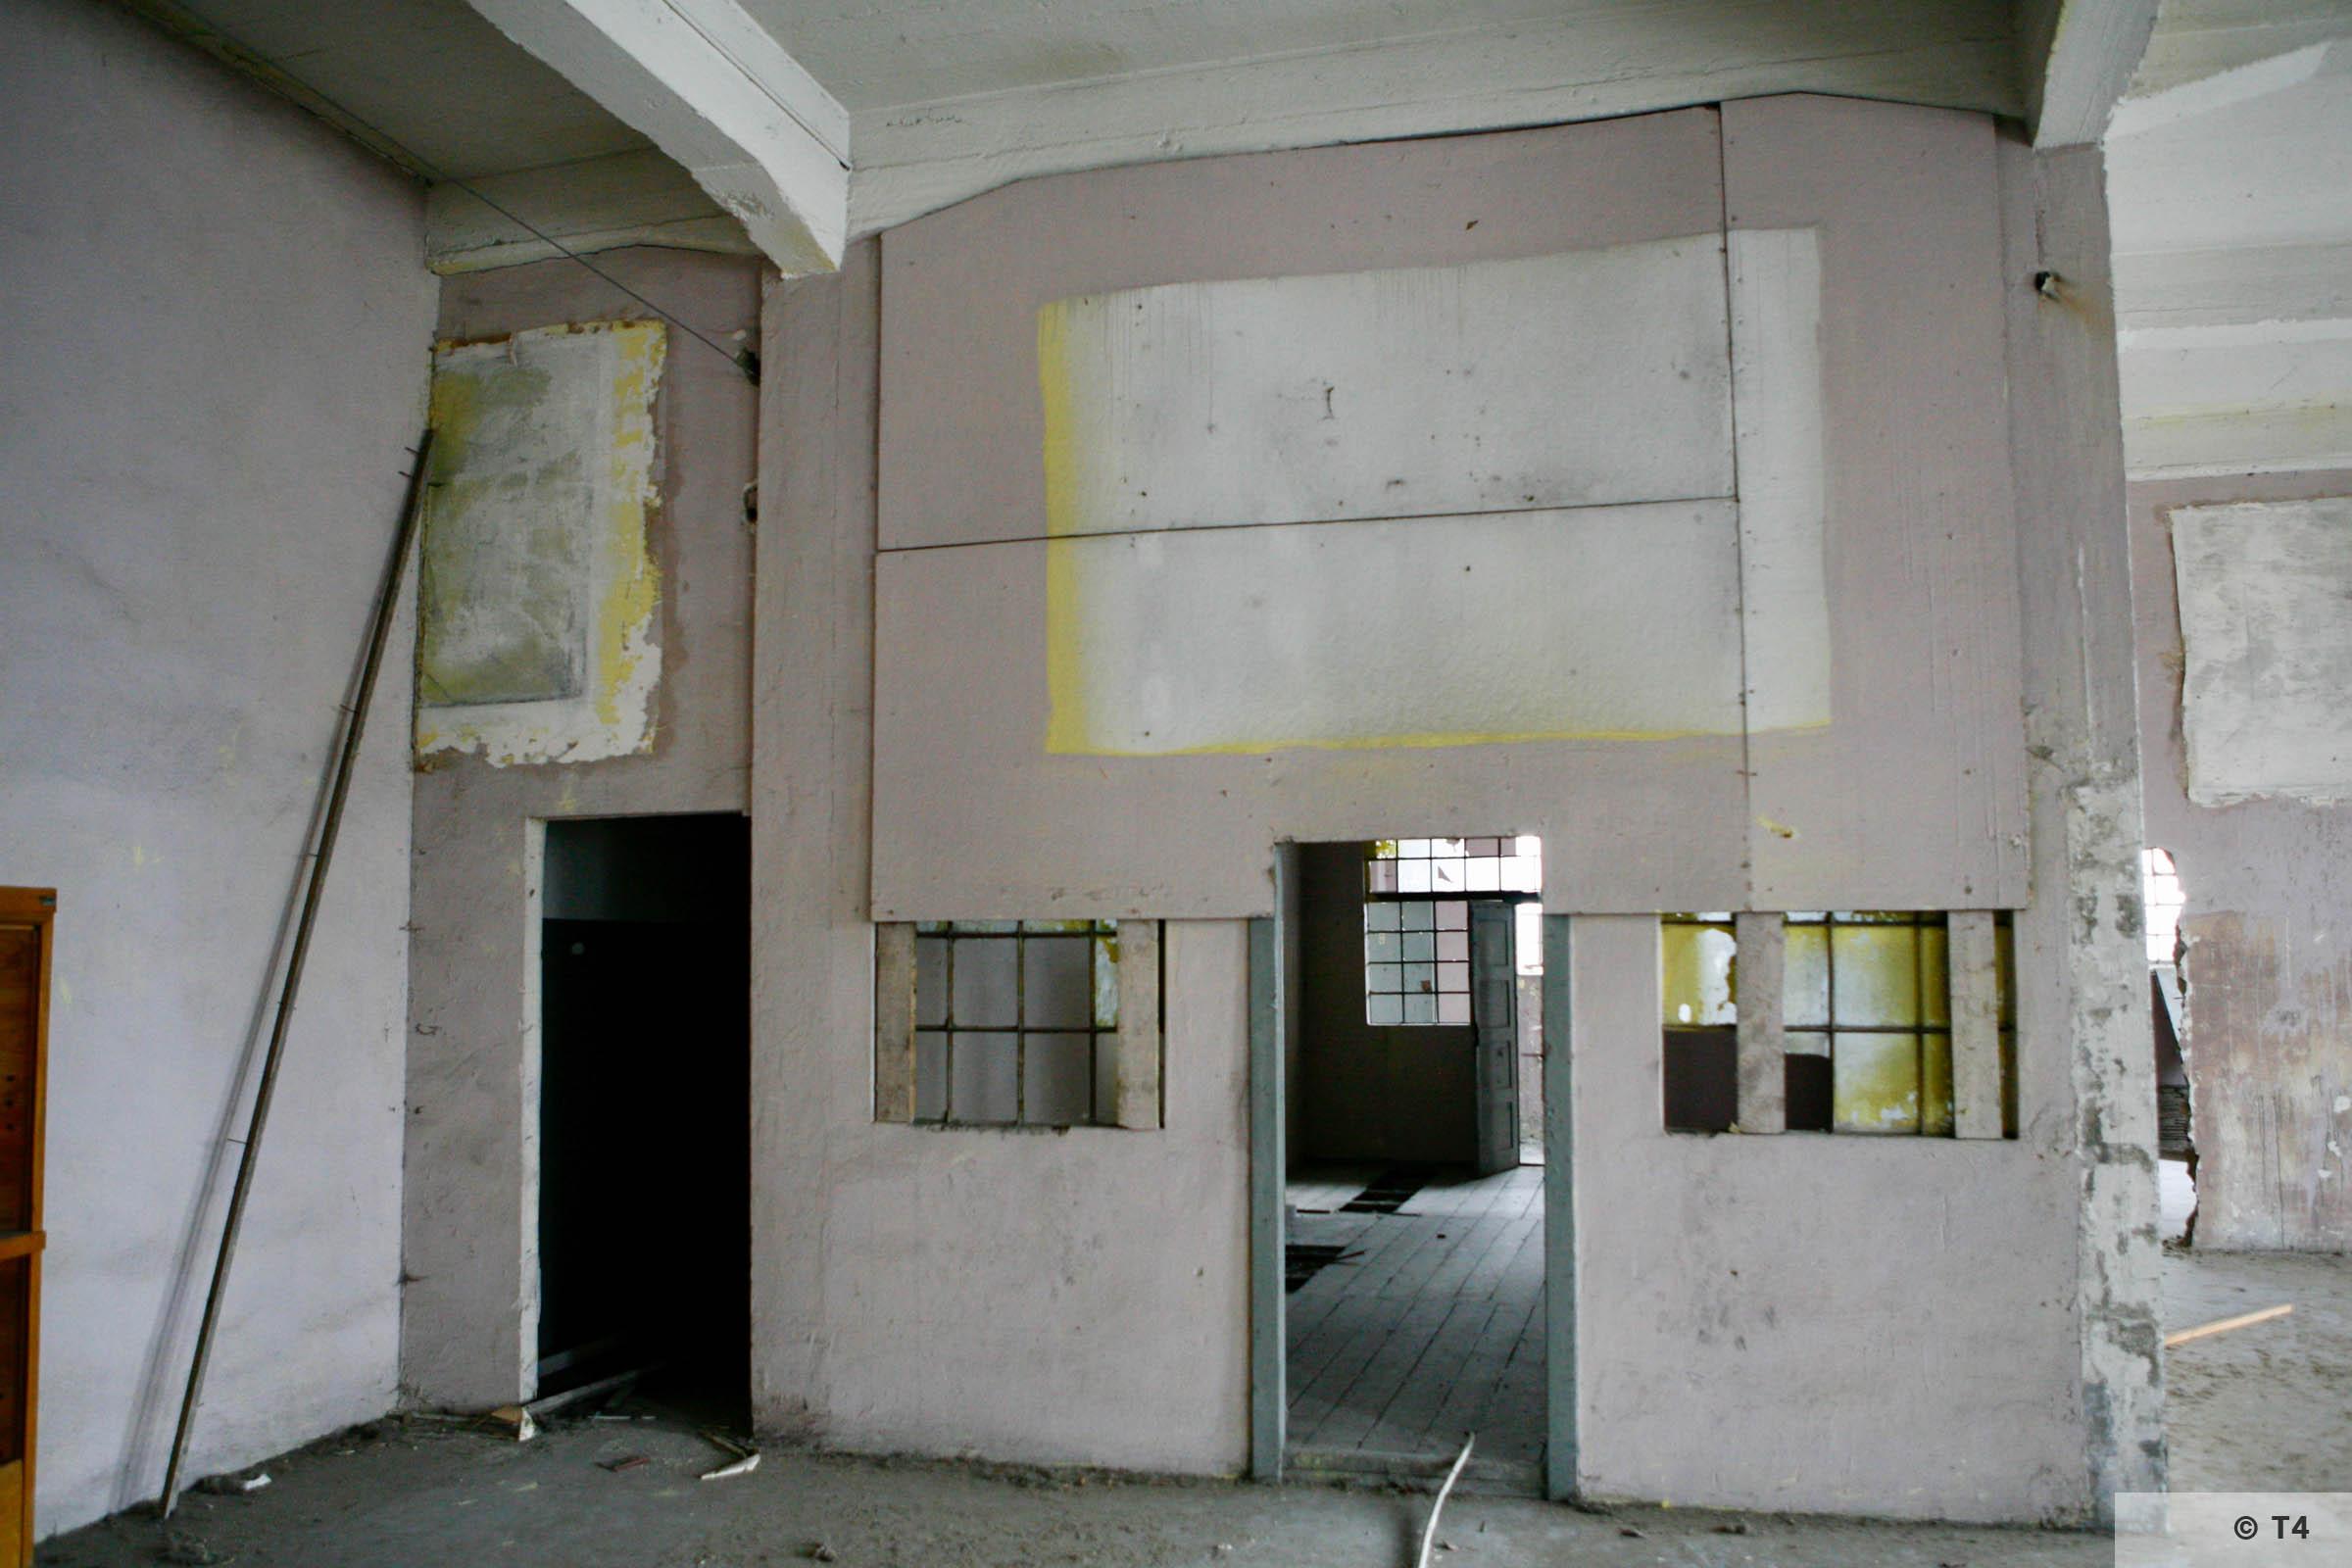 Remnants of frescos. 2006 T4 3406